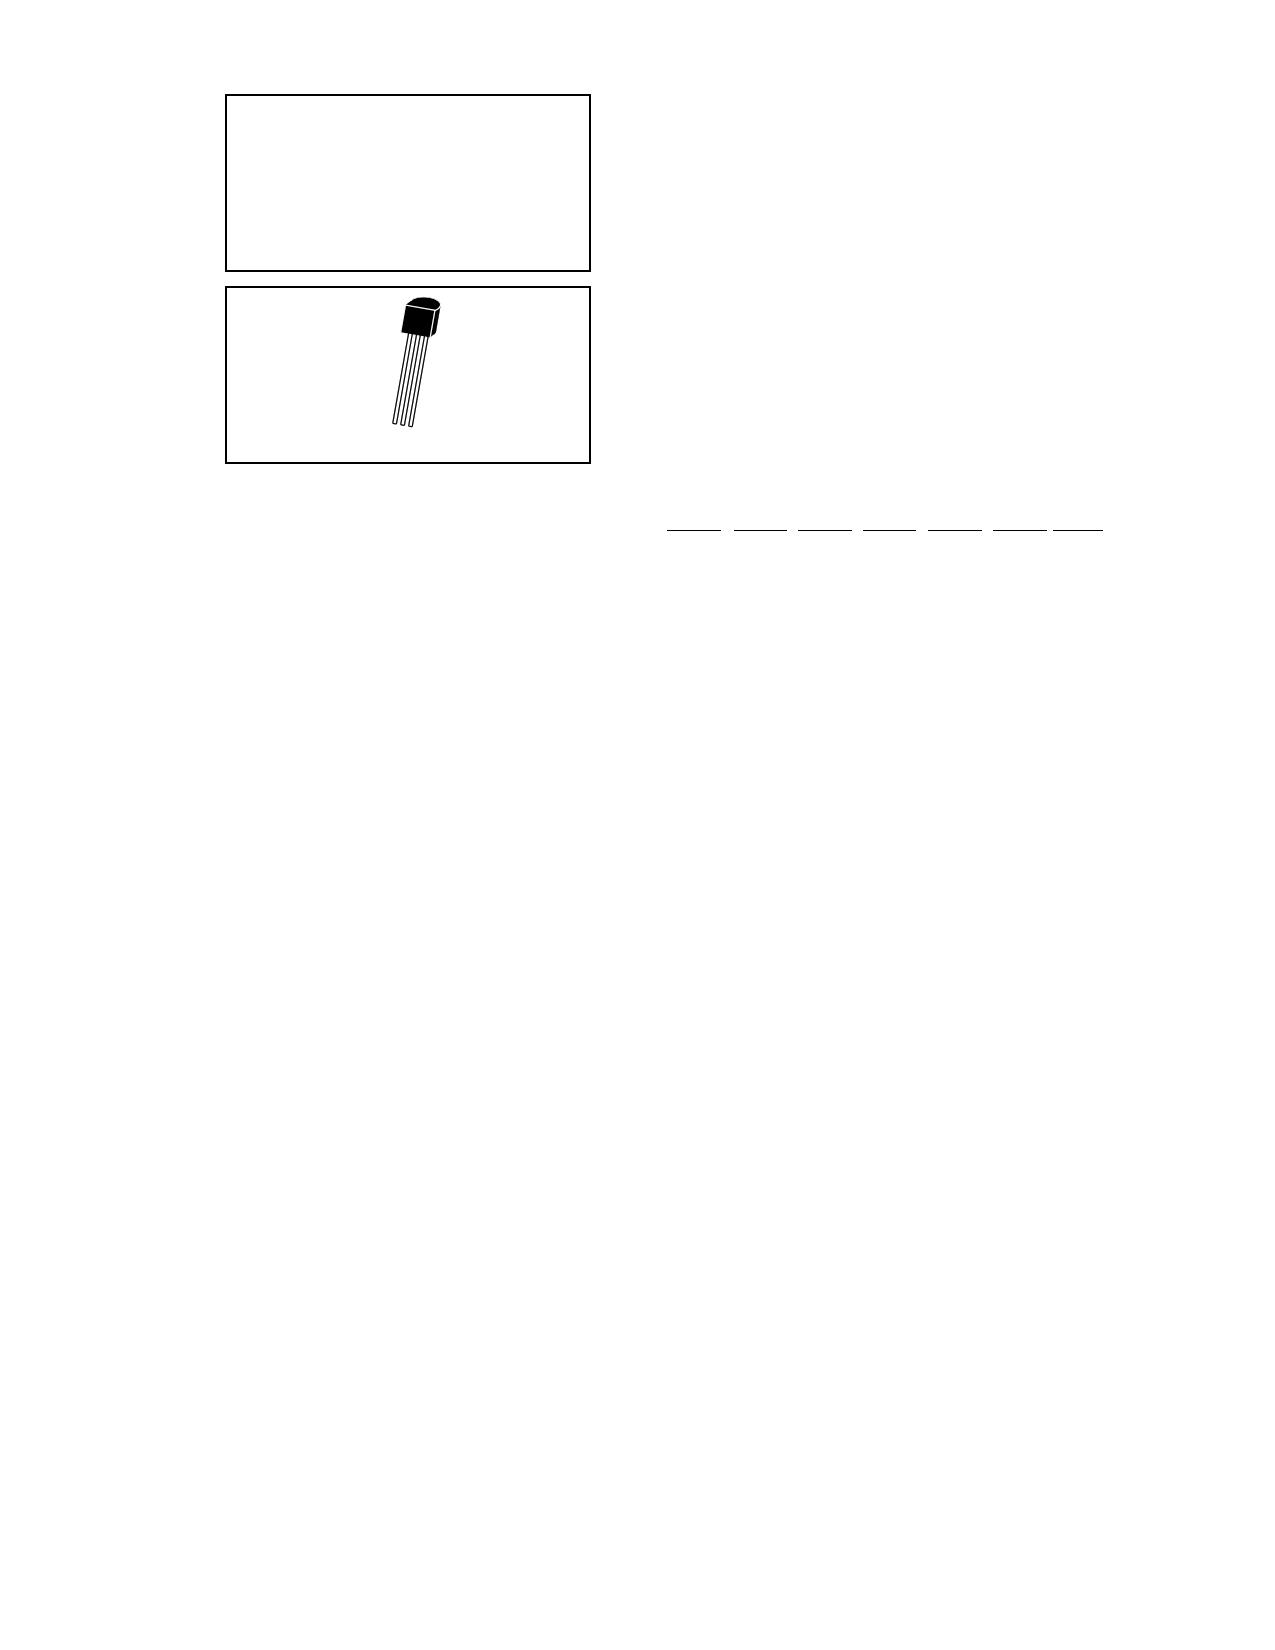 BRX48 Datasheet, BRX48 PDF,ピン配置, 機能